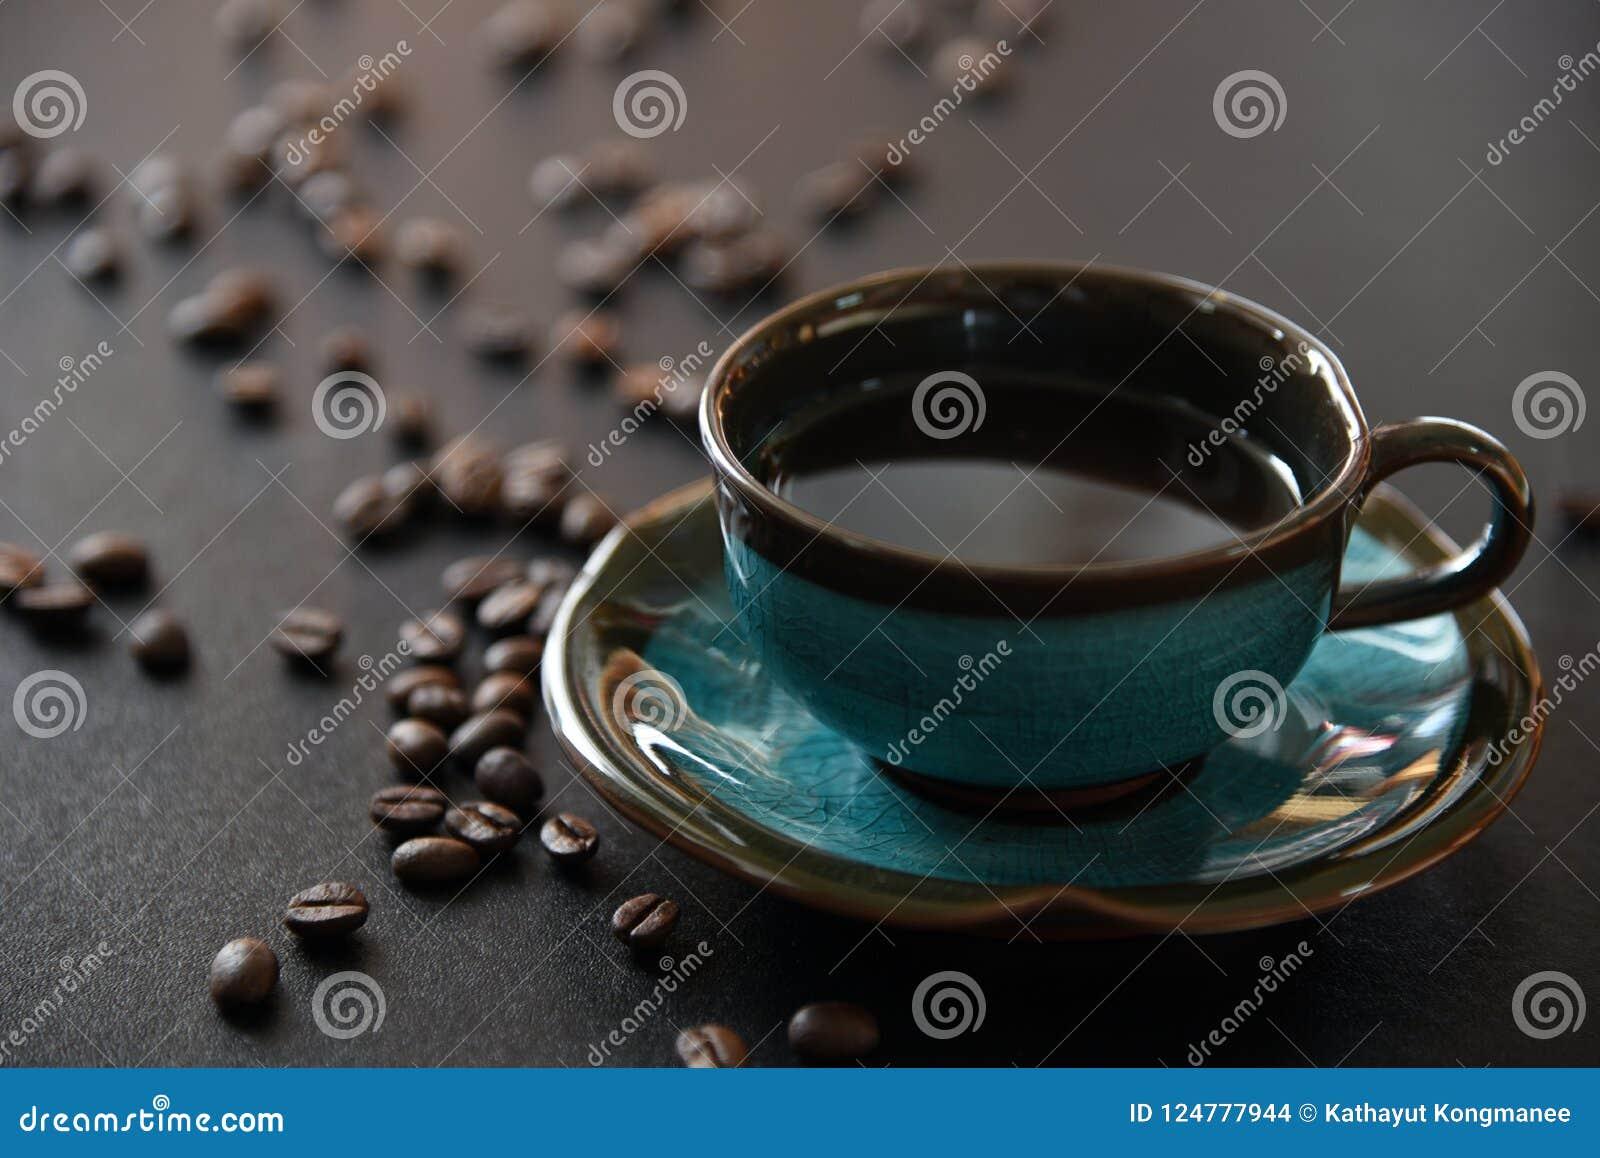 black coffee and coffee bean